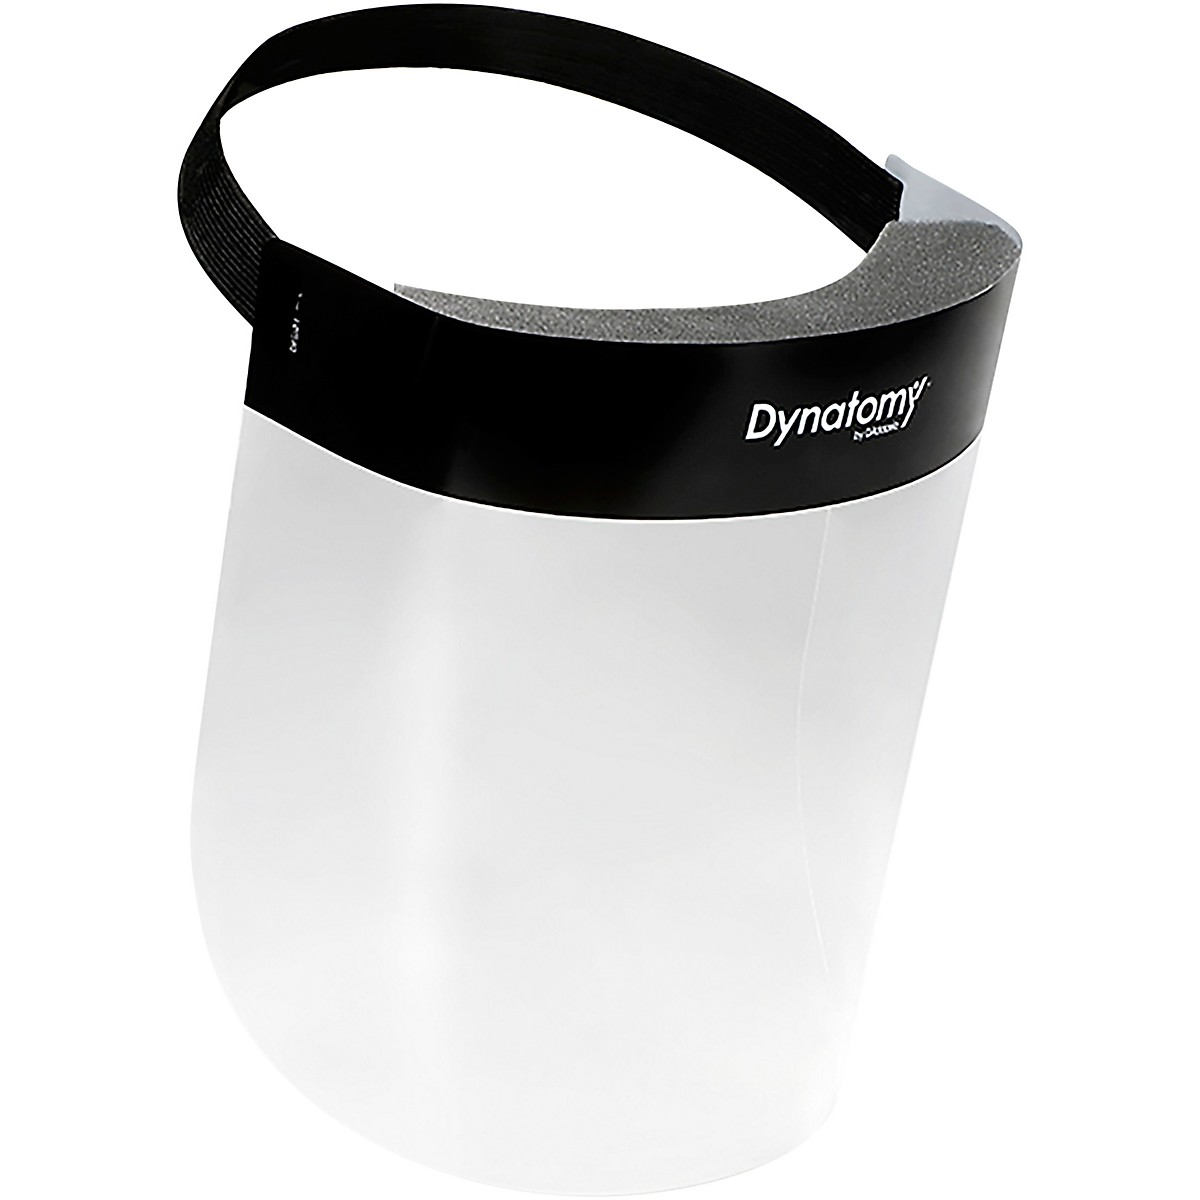 D'Addario Dynatomy Single-Use Face Shield 2-Pack